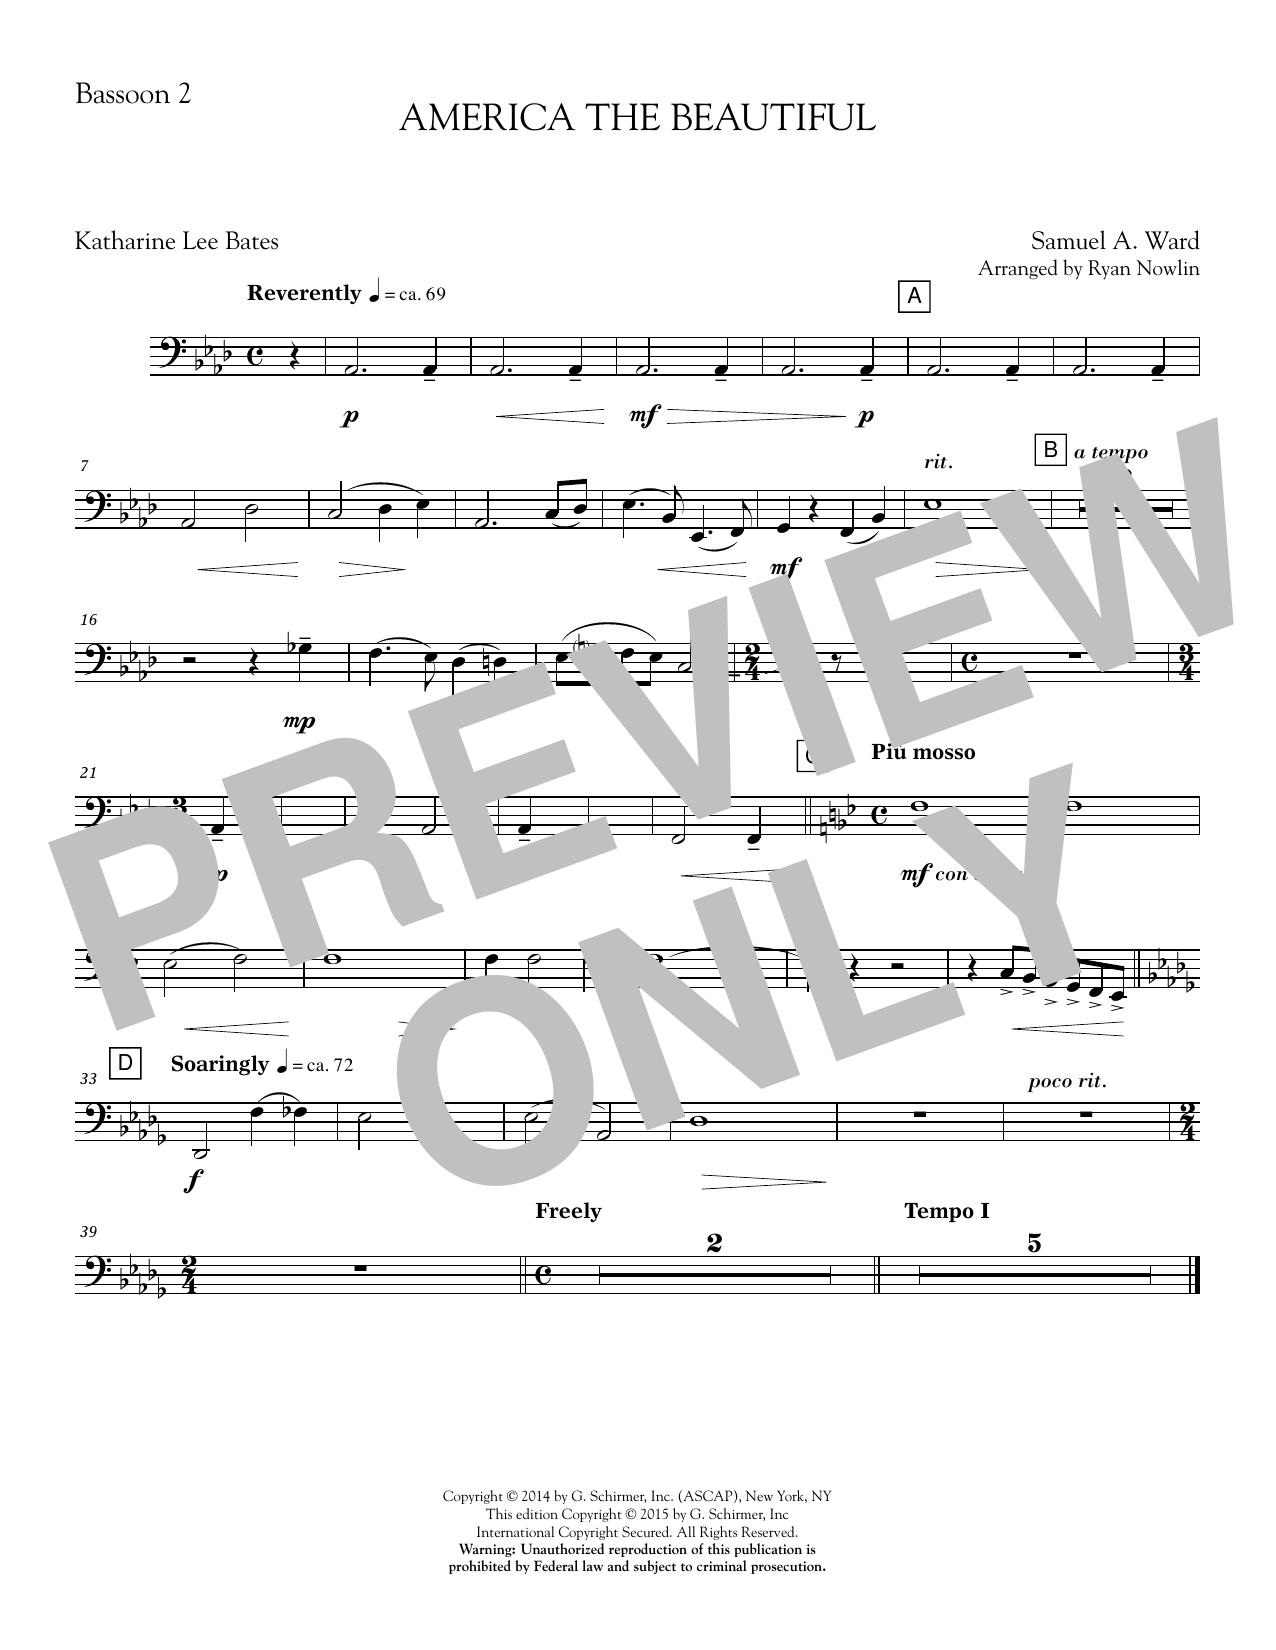 America, the Beautiful - Bassoon 2 Sheet Music